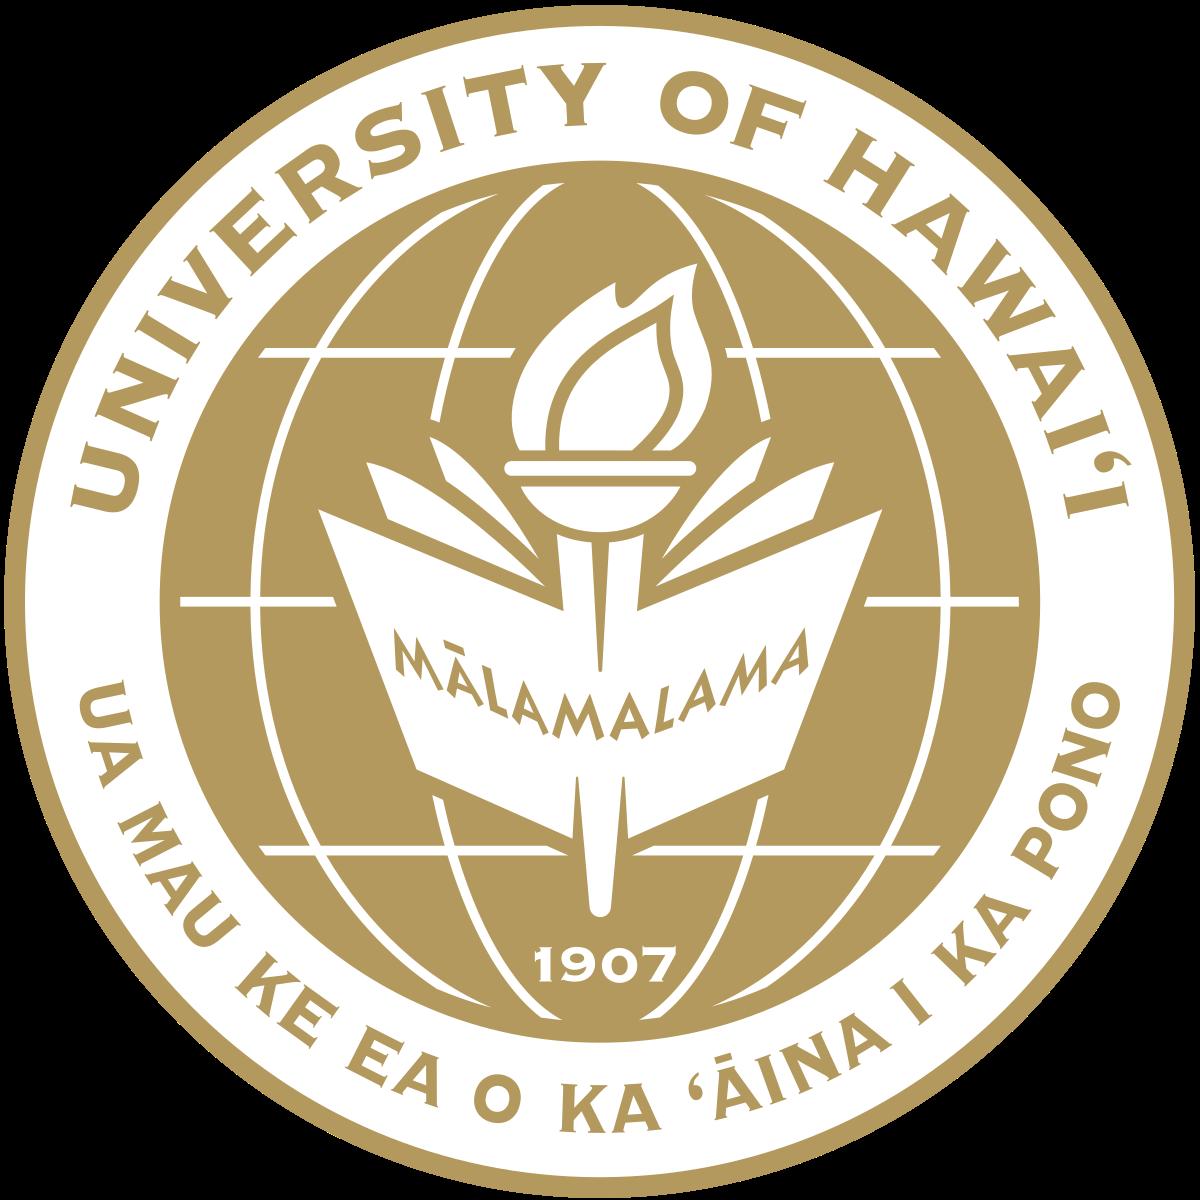 University of Hawaii.